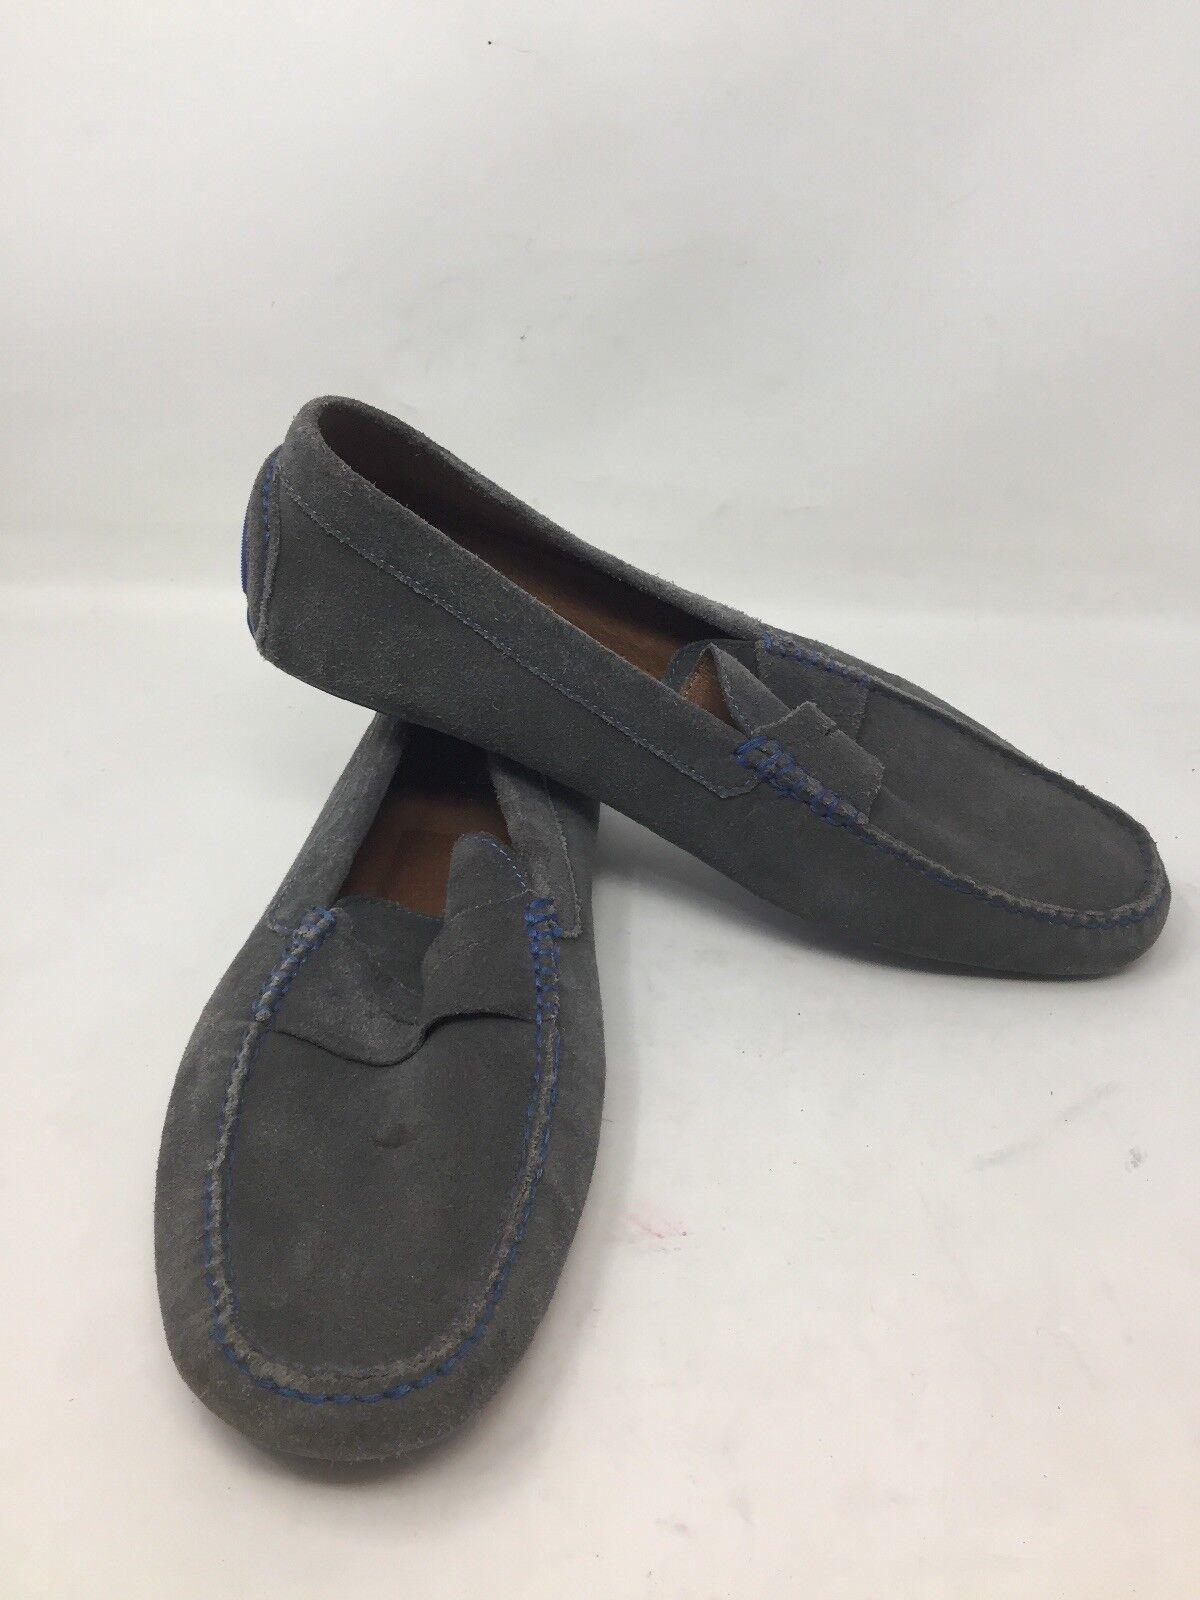 Donald J Pliner Grey bluee Suede Slip On Loafers Vincos Driving Mocs 12M B7A